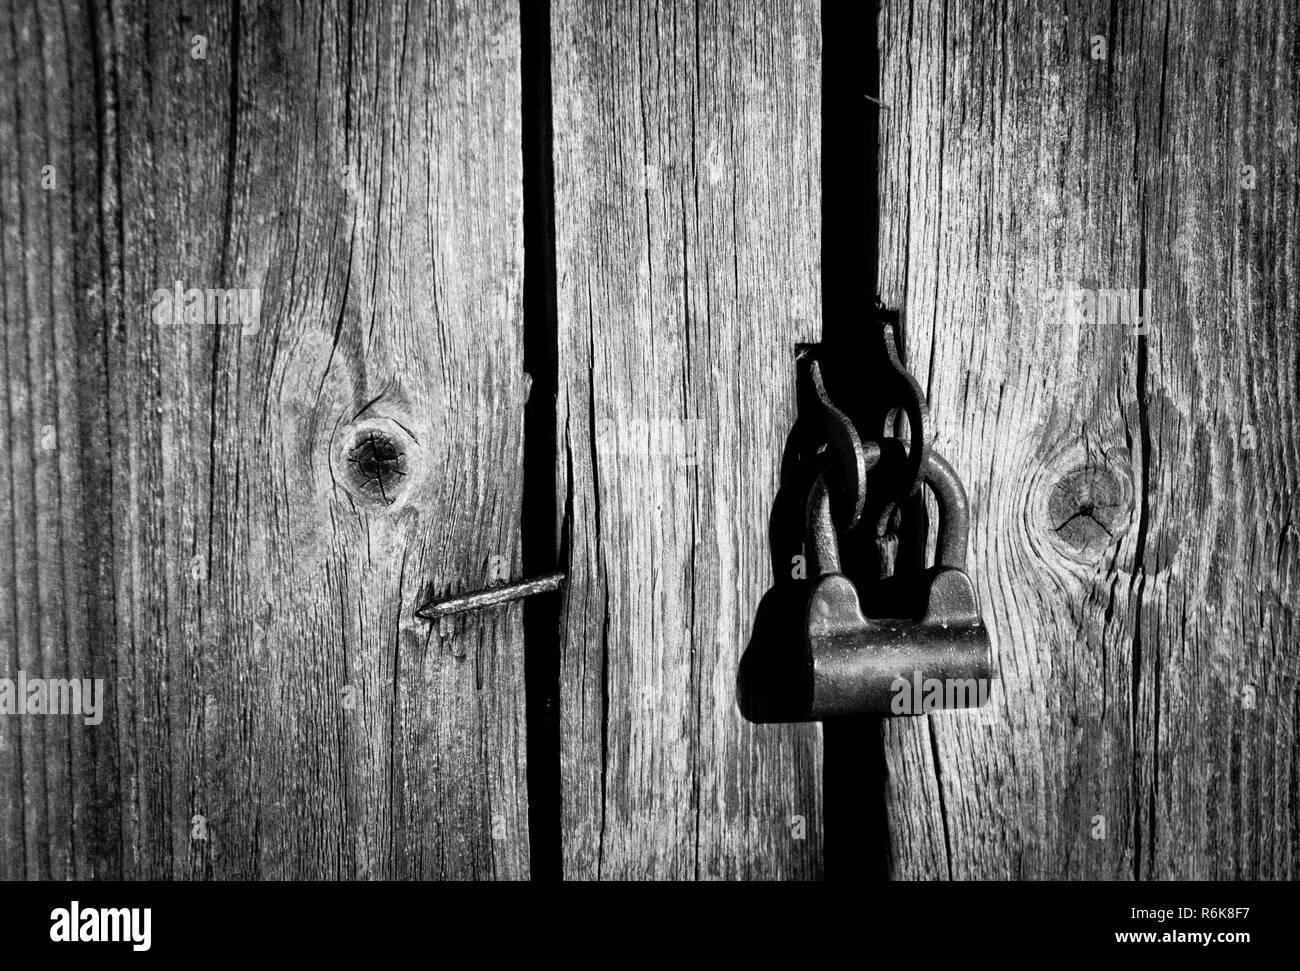 Old lock on the wooden door - Stock Image